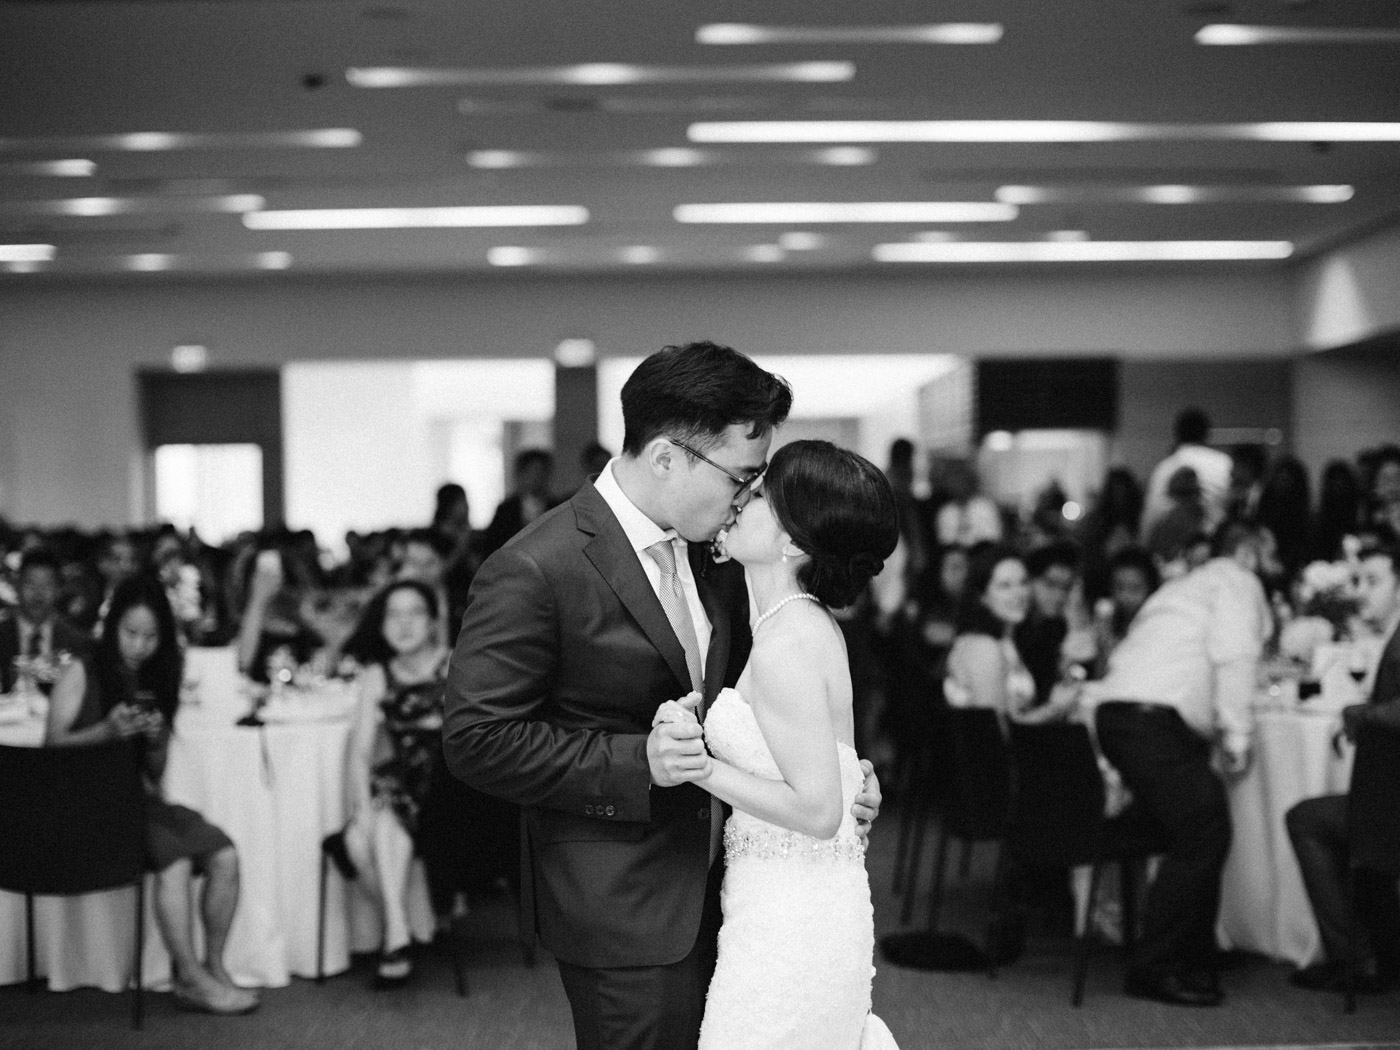 toronto_wedding_photographer_fine_art_documentary_photography-91.jpg